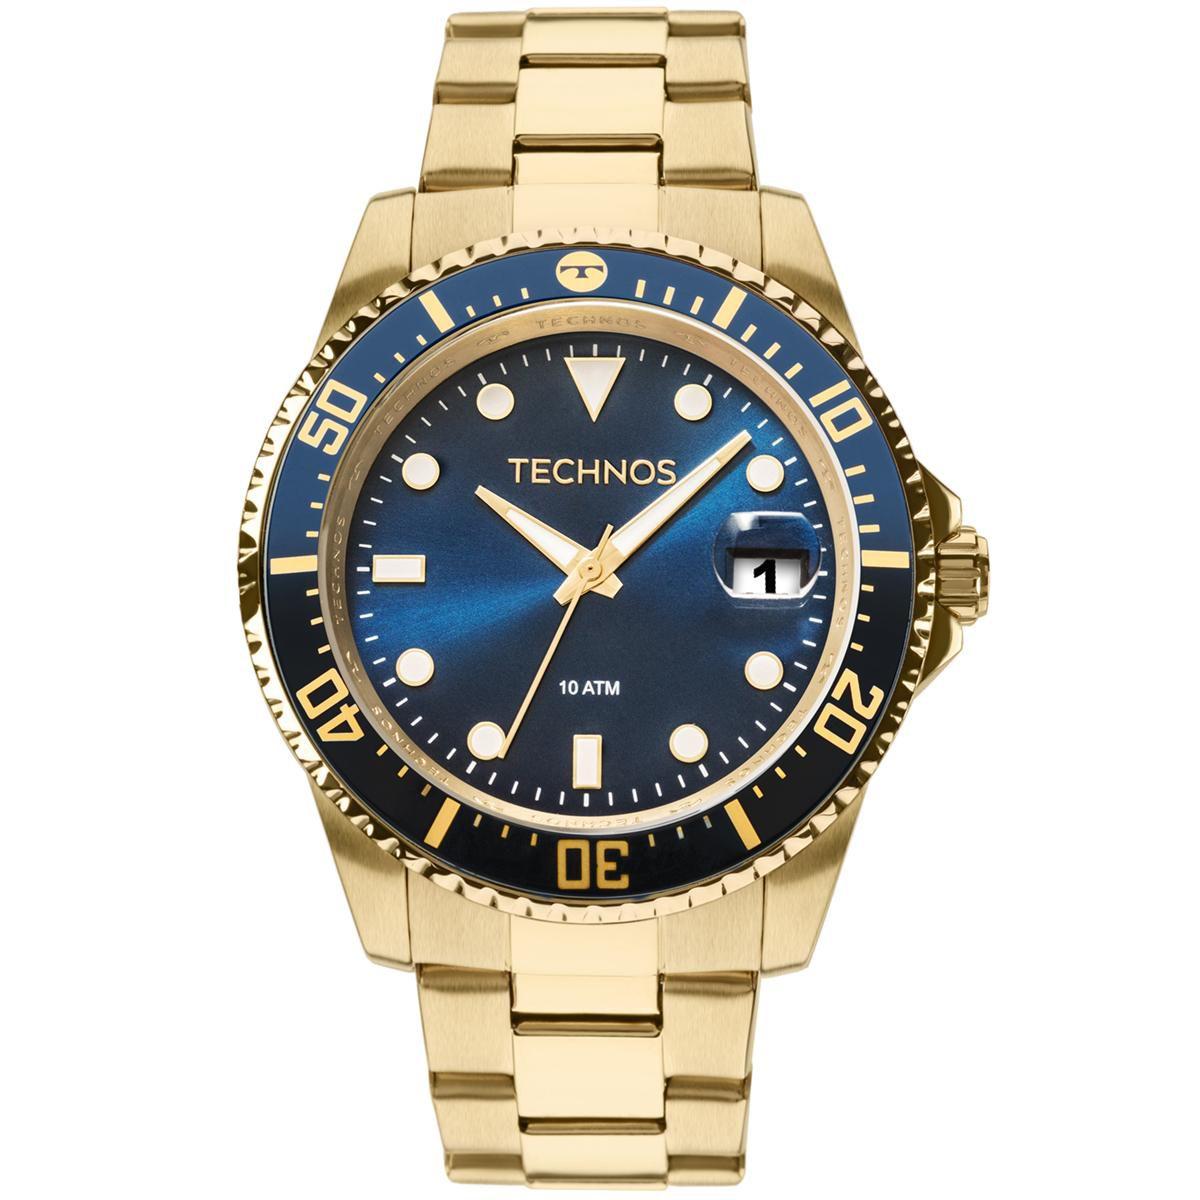 Relógio Masculino Technos Skymaster 2415CK/4A 47mm Aço Dourado